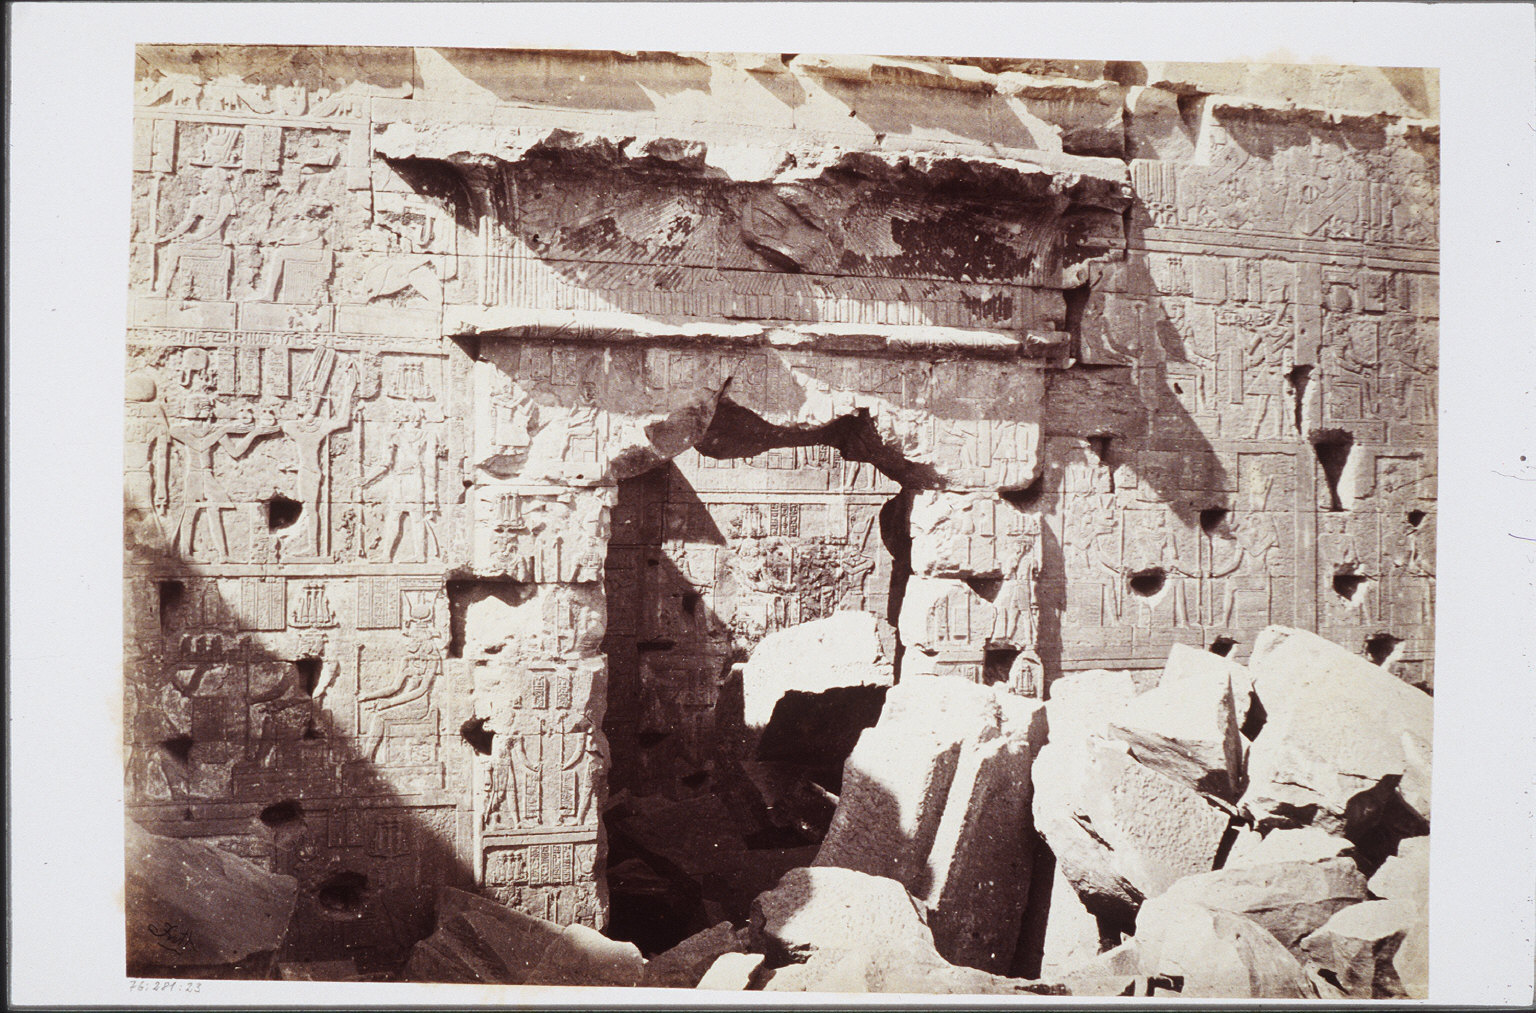 Doorway in the Temple of Kalabshe, Nubia